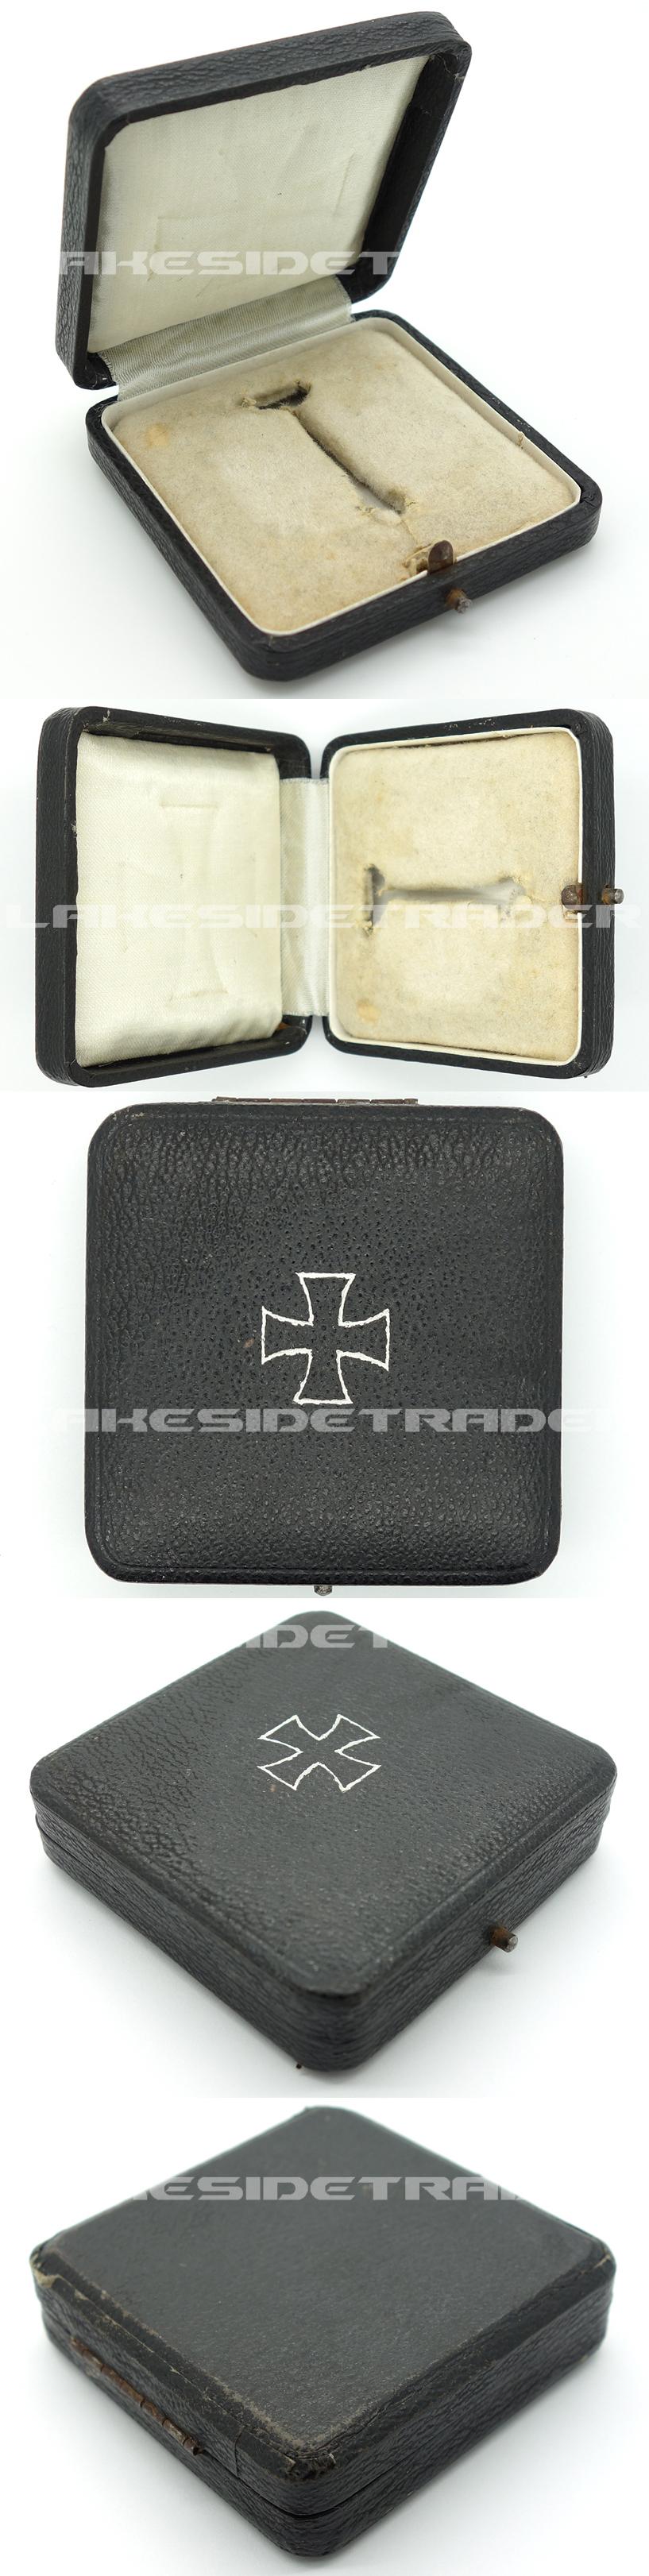 1st Class Iron Cross Case